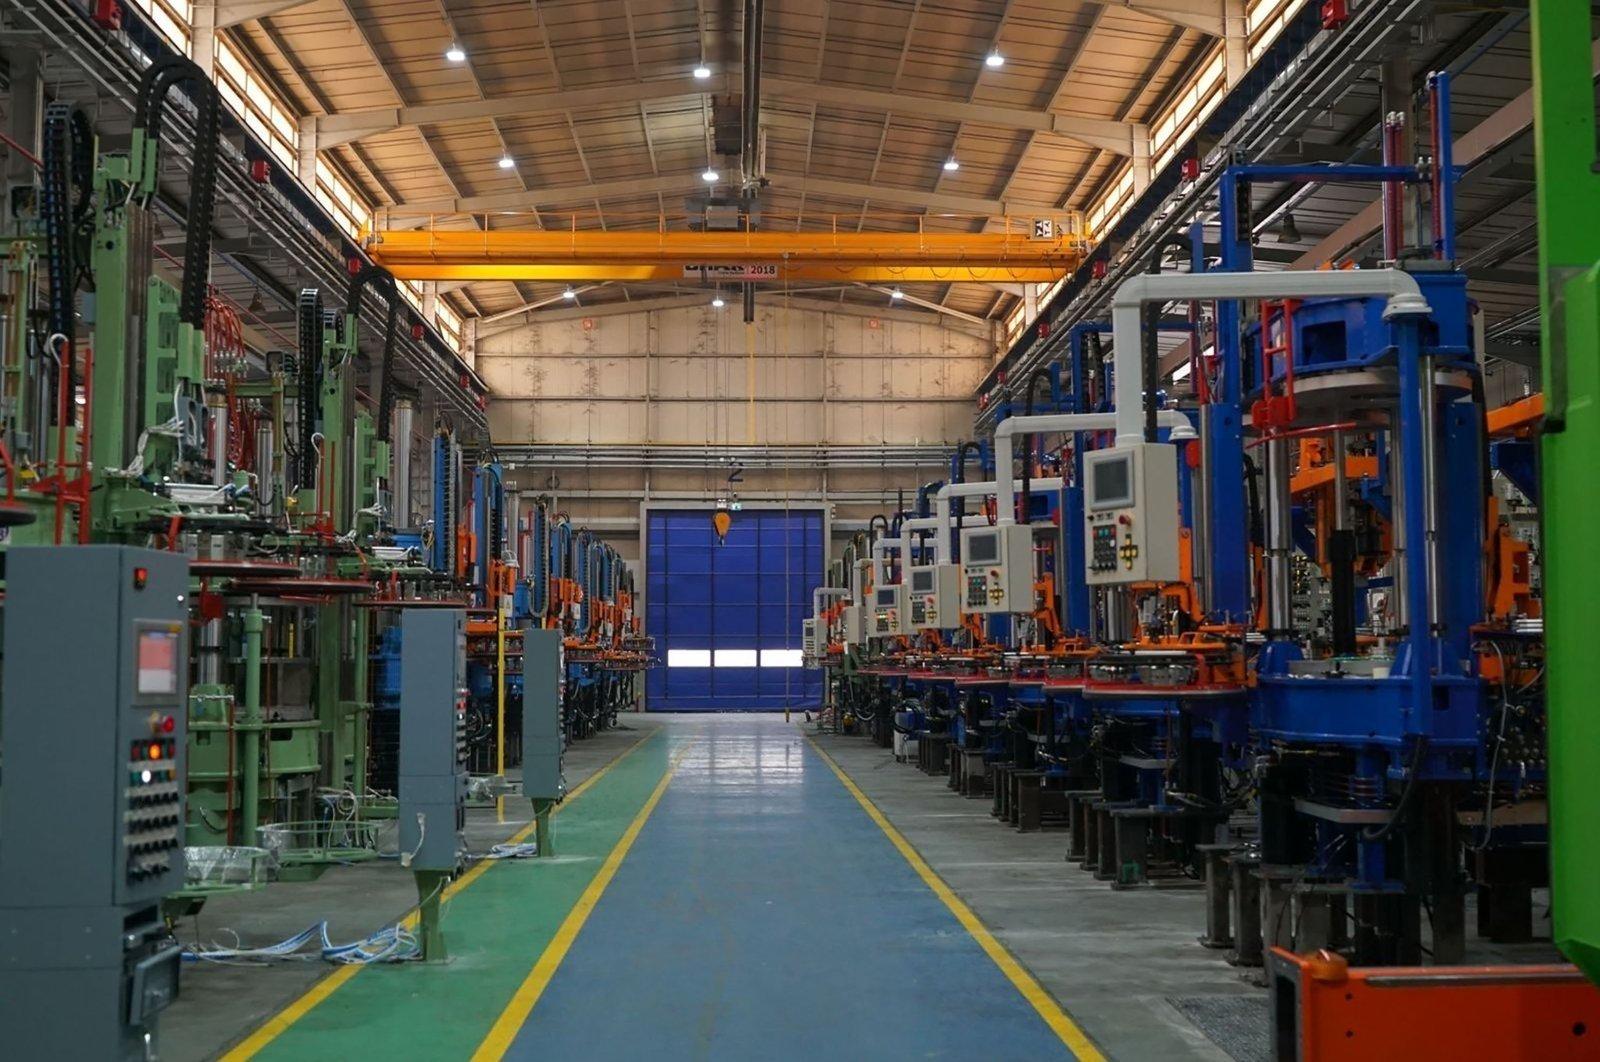 A mold press machinery factory in the Arslanbey Organized Industrial Zone in Kocaeli, northwestern Turkey, June 26, 2020. (Sabah Photo)